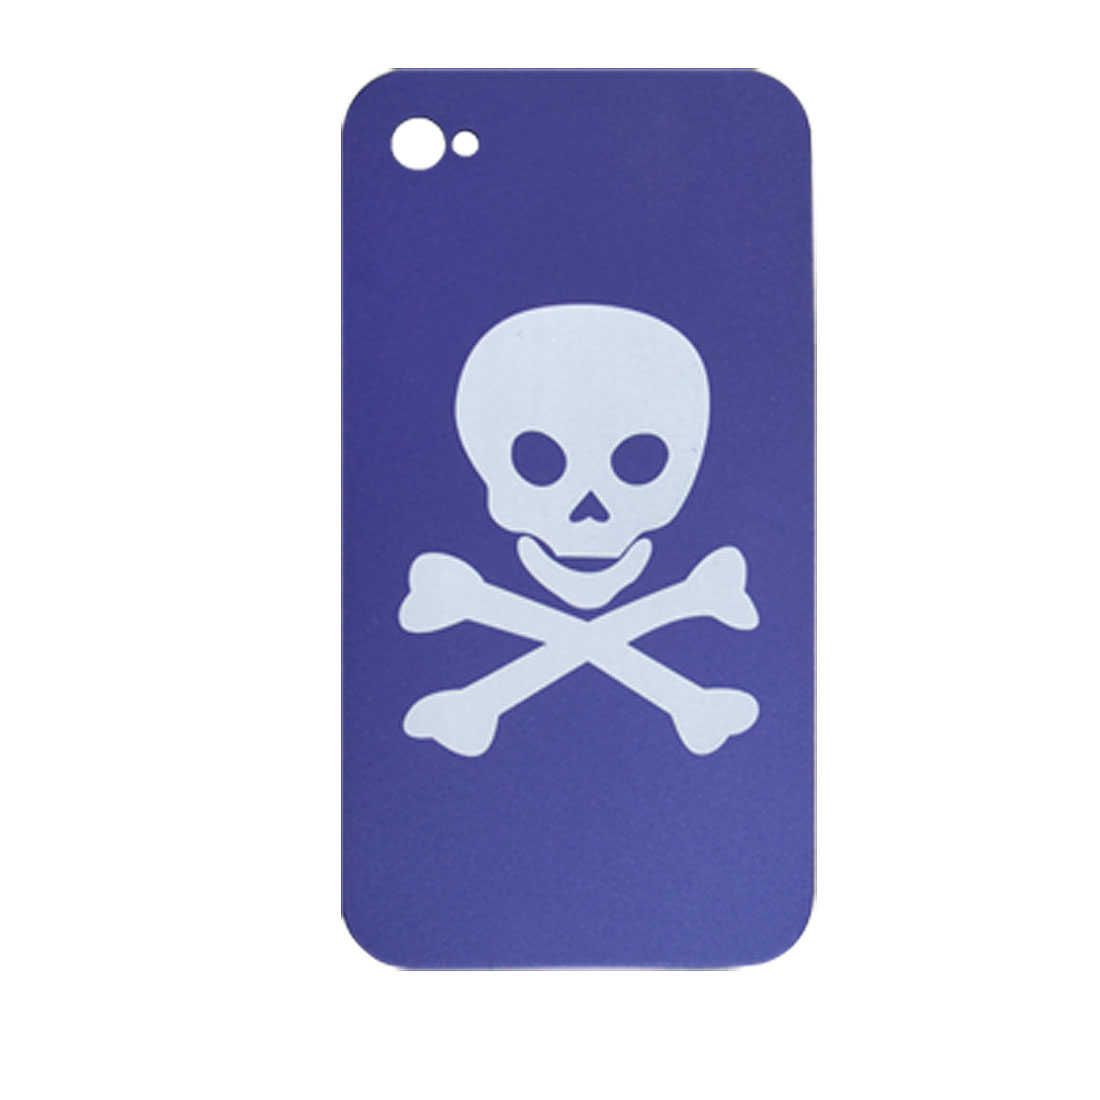 Skull Pattern Blue Rubberriazed Hard Back Case for iPhone 4 4G